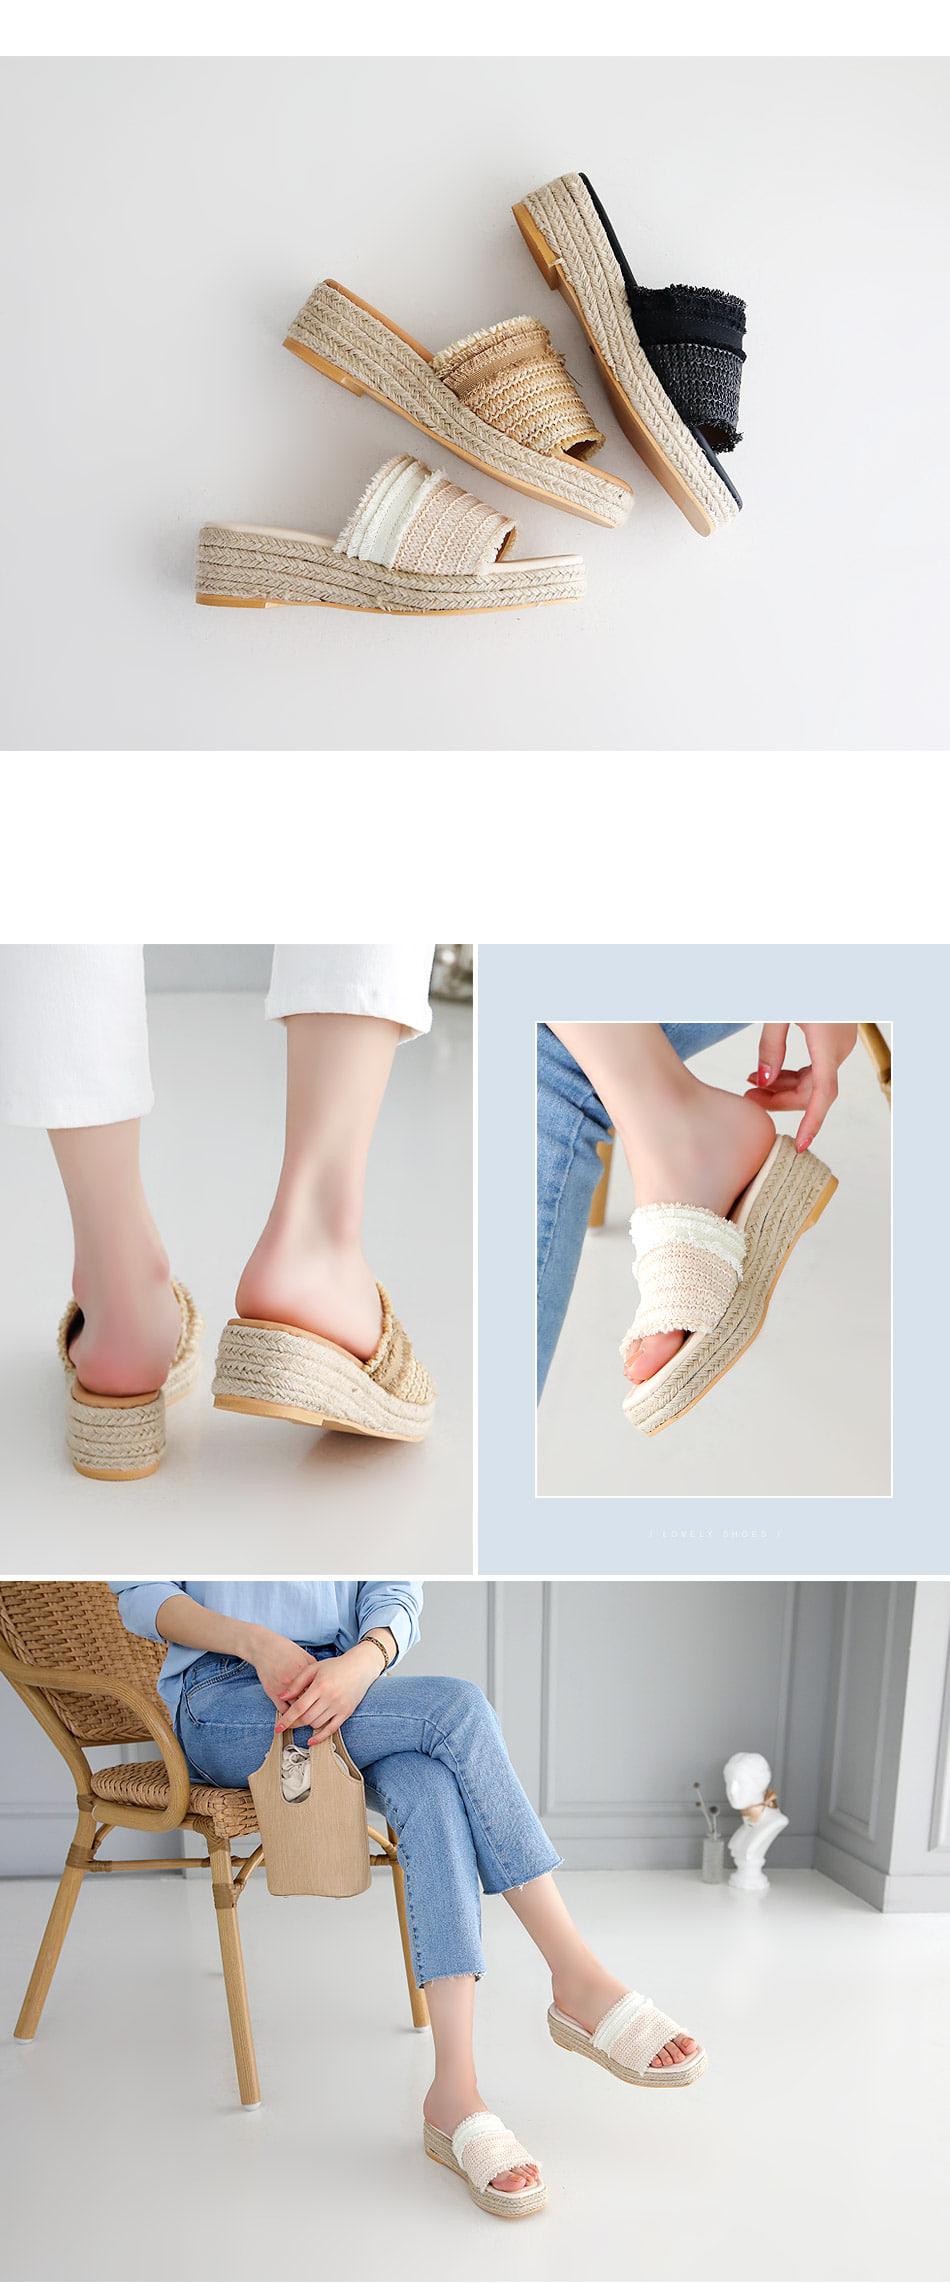 Raffia Espudee slippers 4.5cm